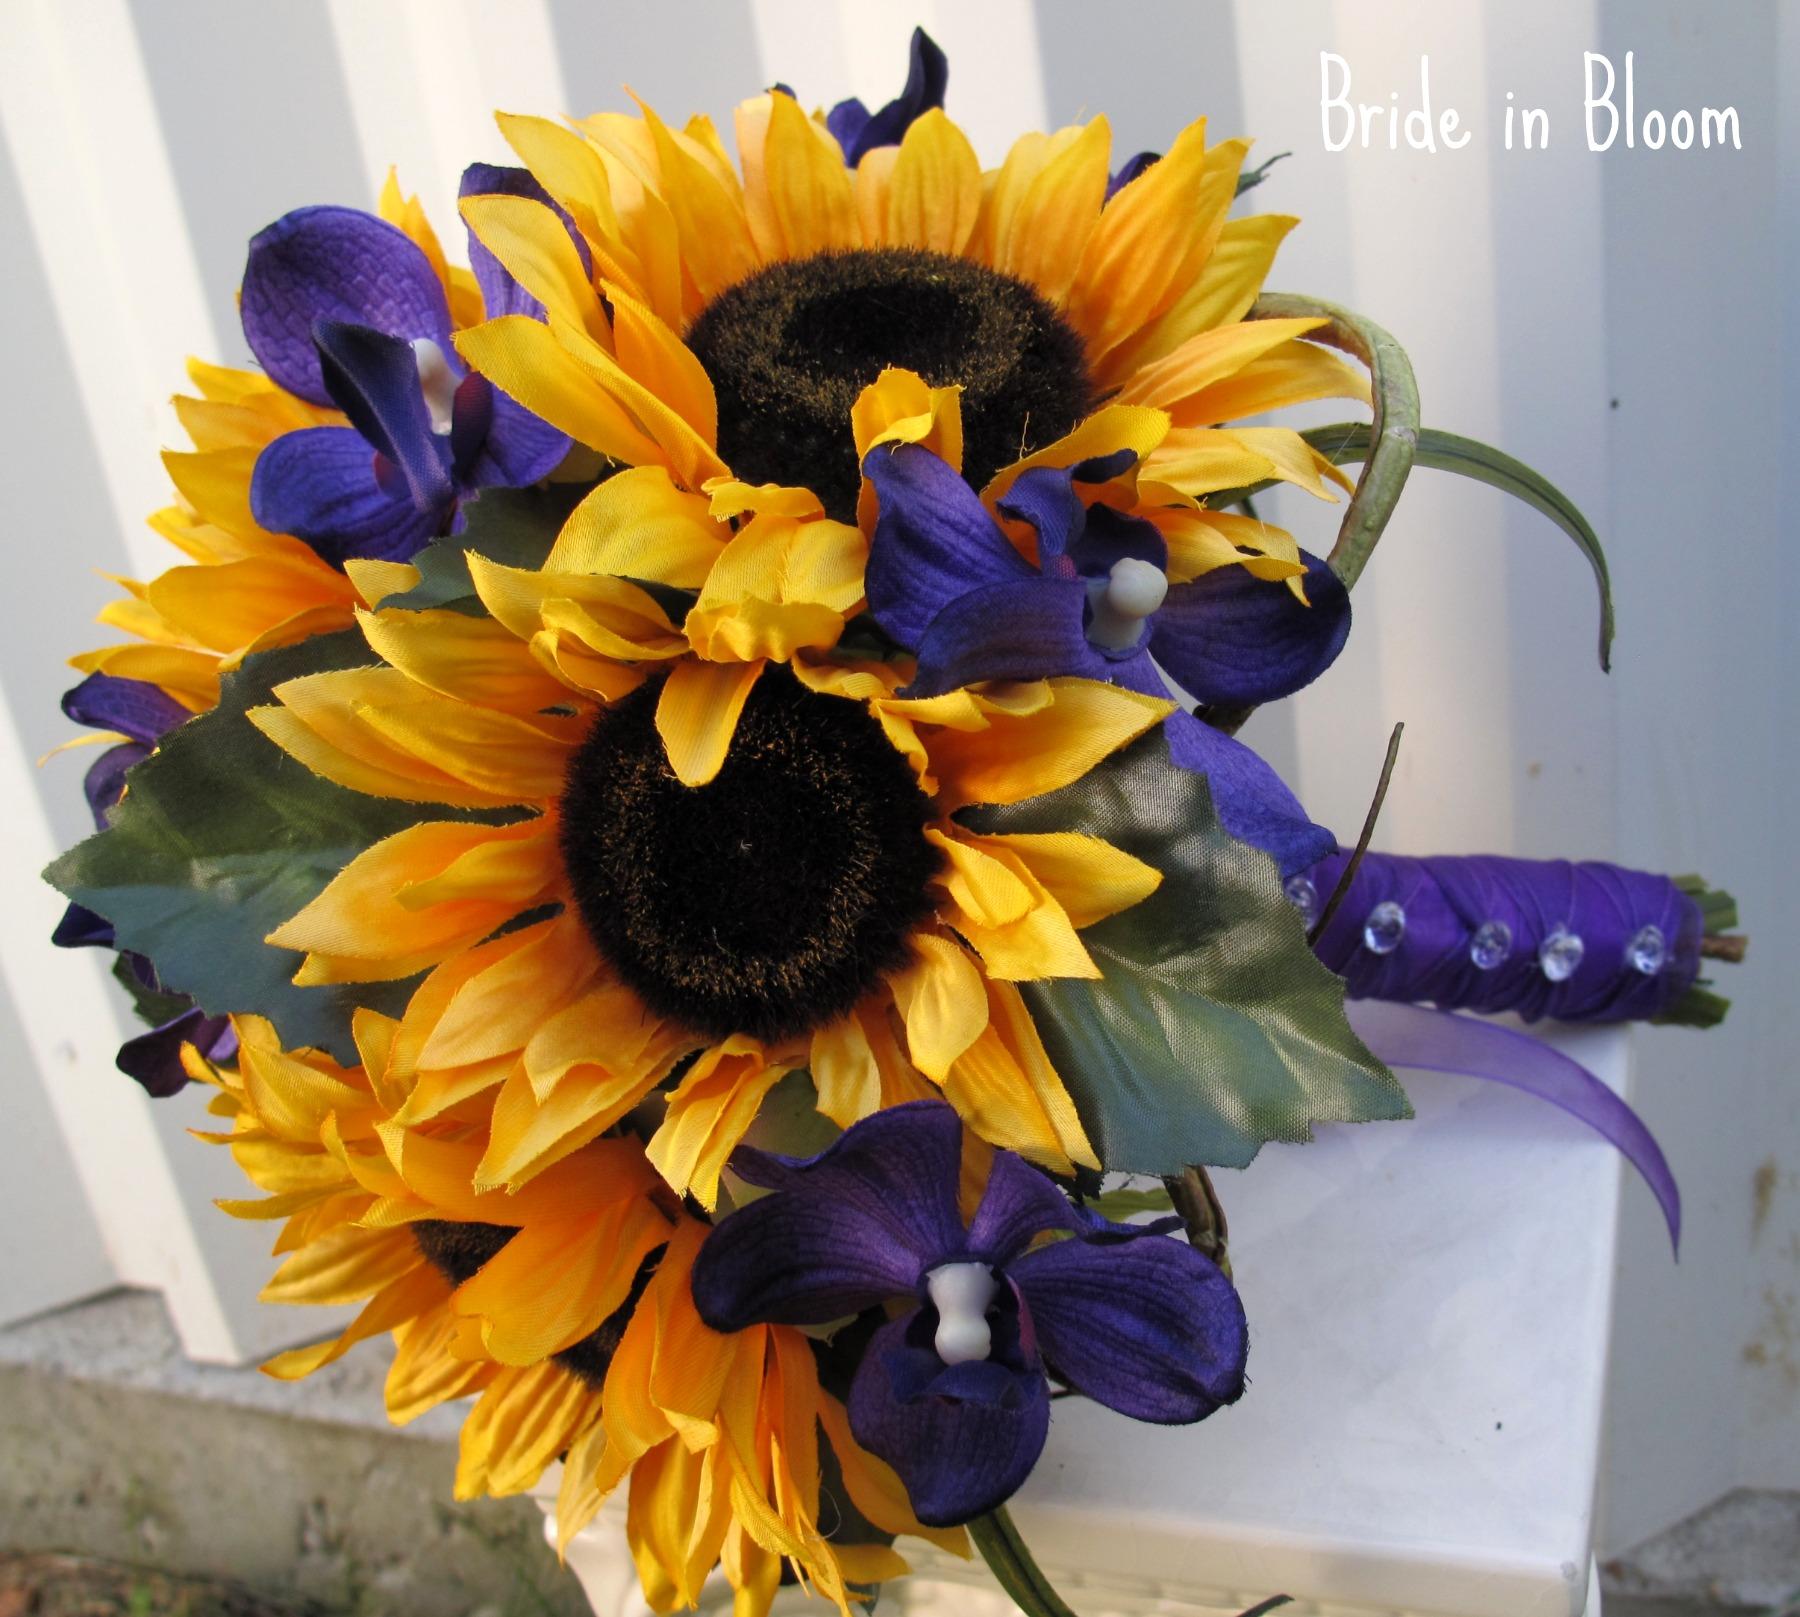 Wedding Flowers With Sunflowers : Sunflower wedding bouquet bride in bloom